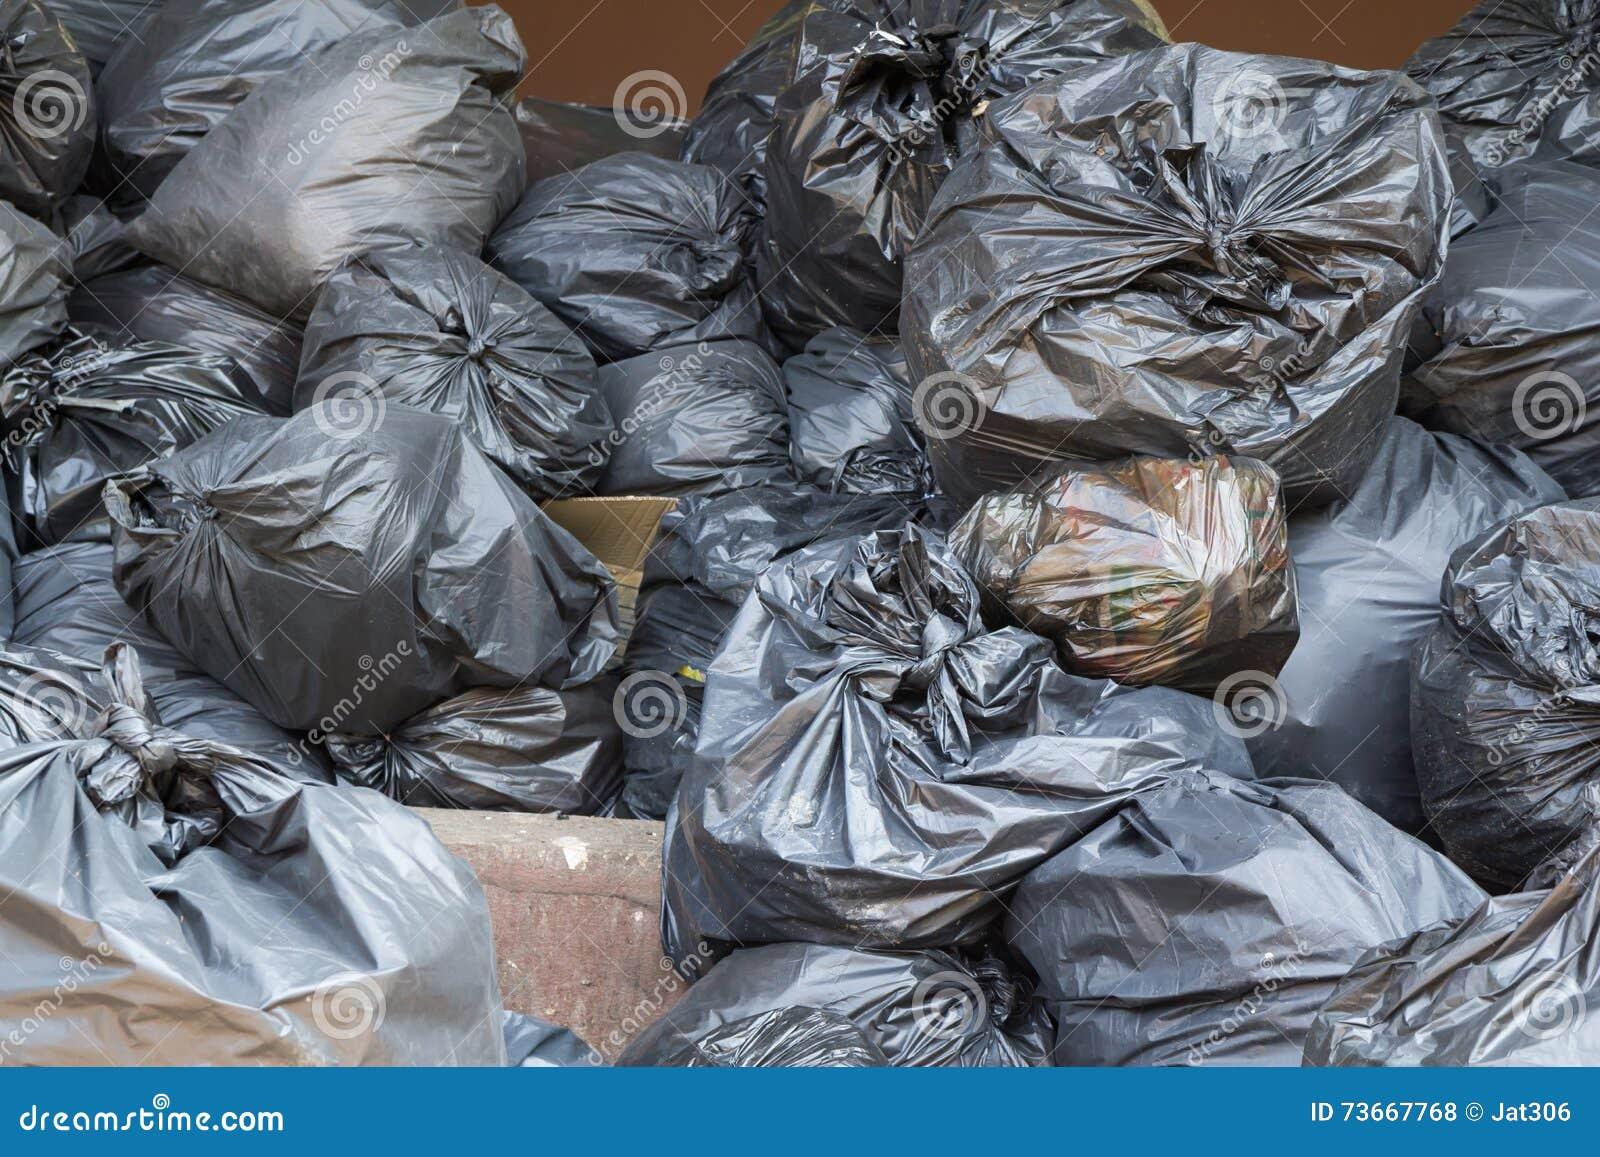 Black Trash Bags Pile Stock Photo - Image: 73667768